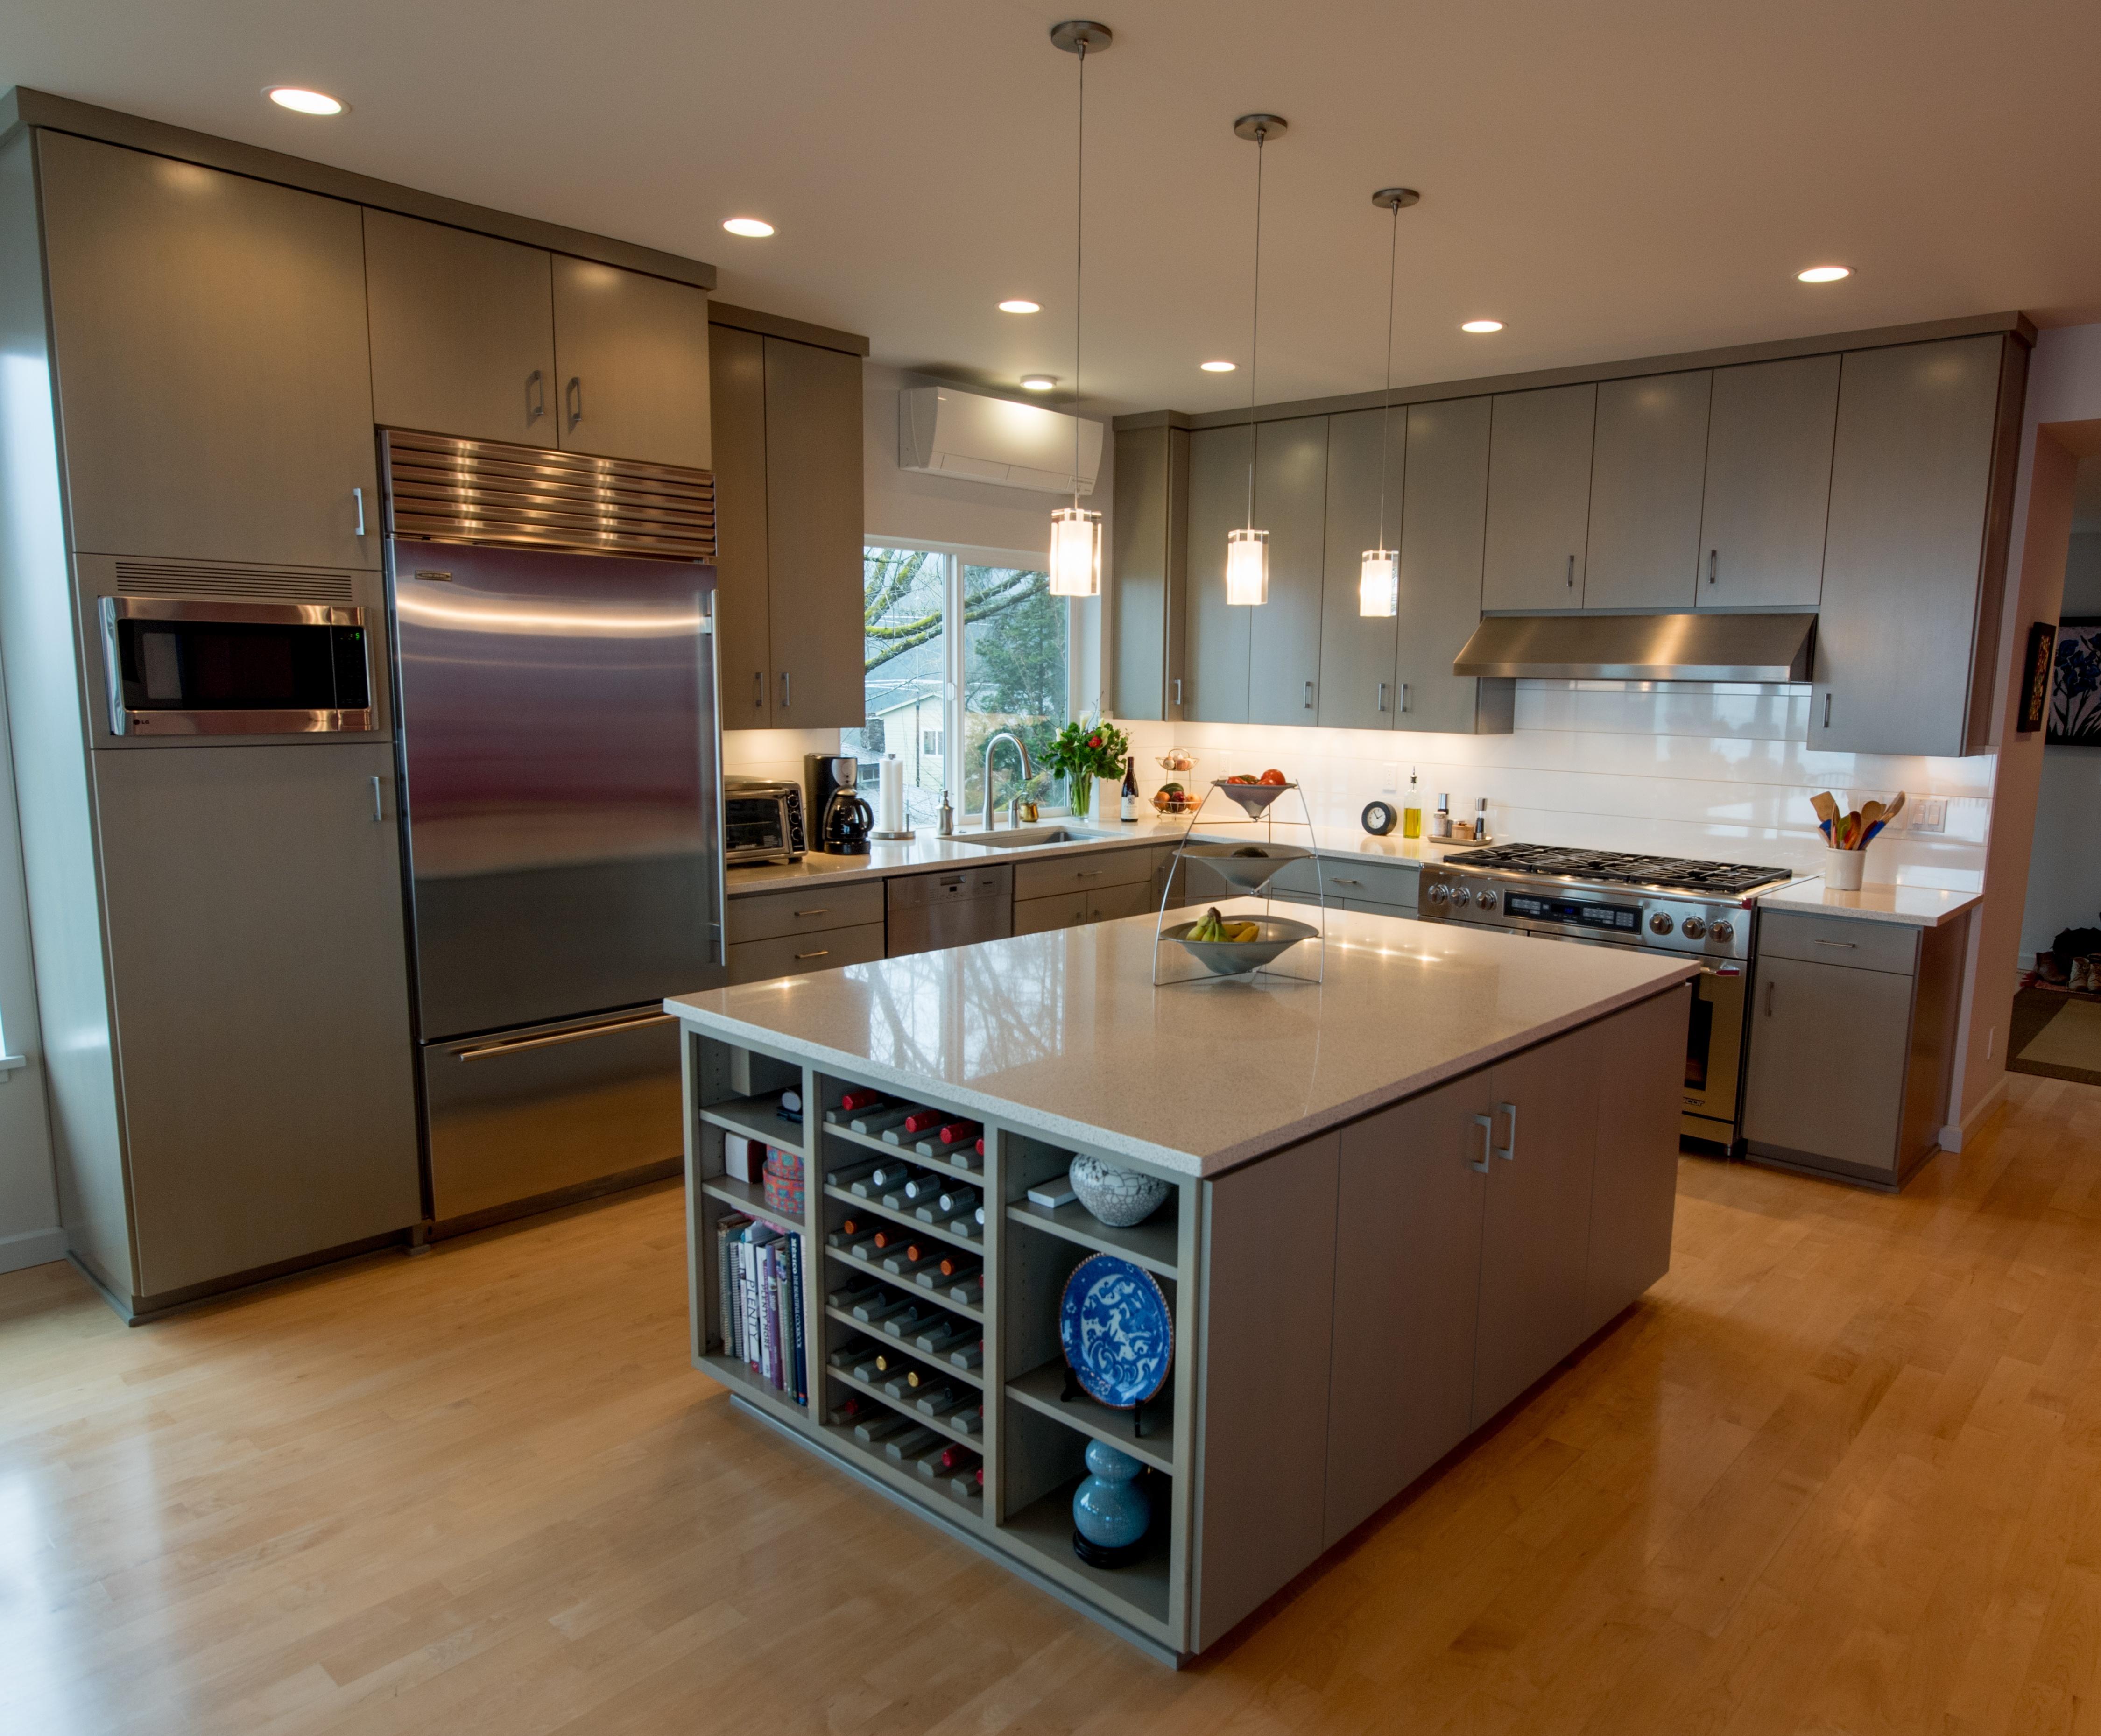 Creative Shelving - Portland Kitchen Remodeling.jpg